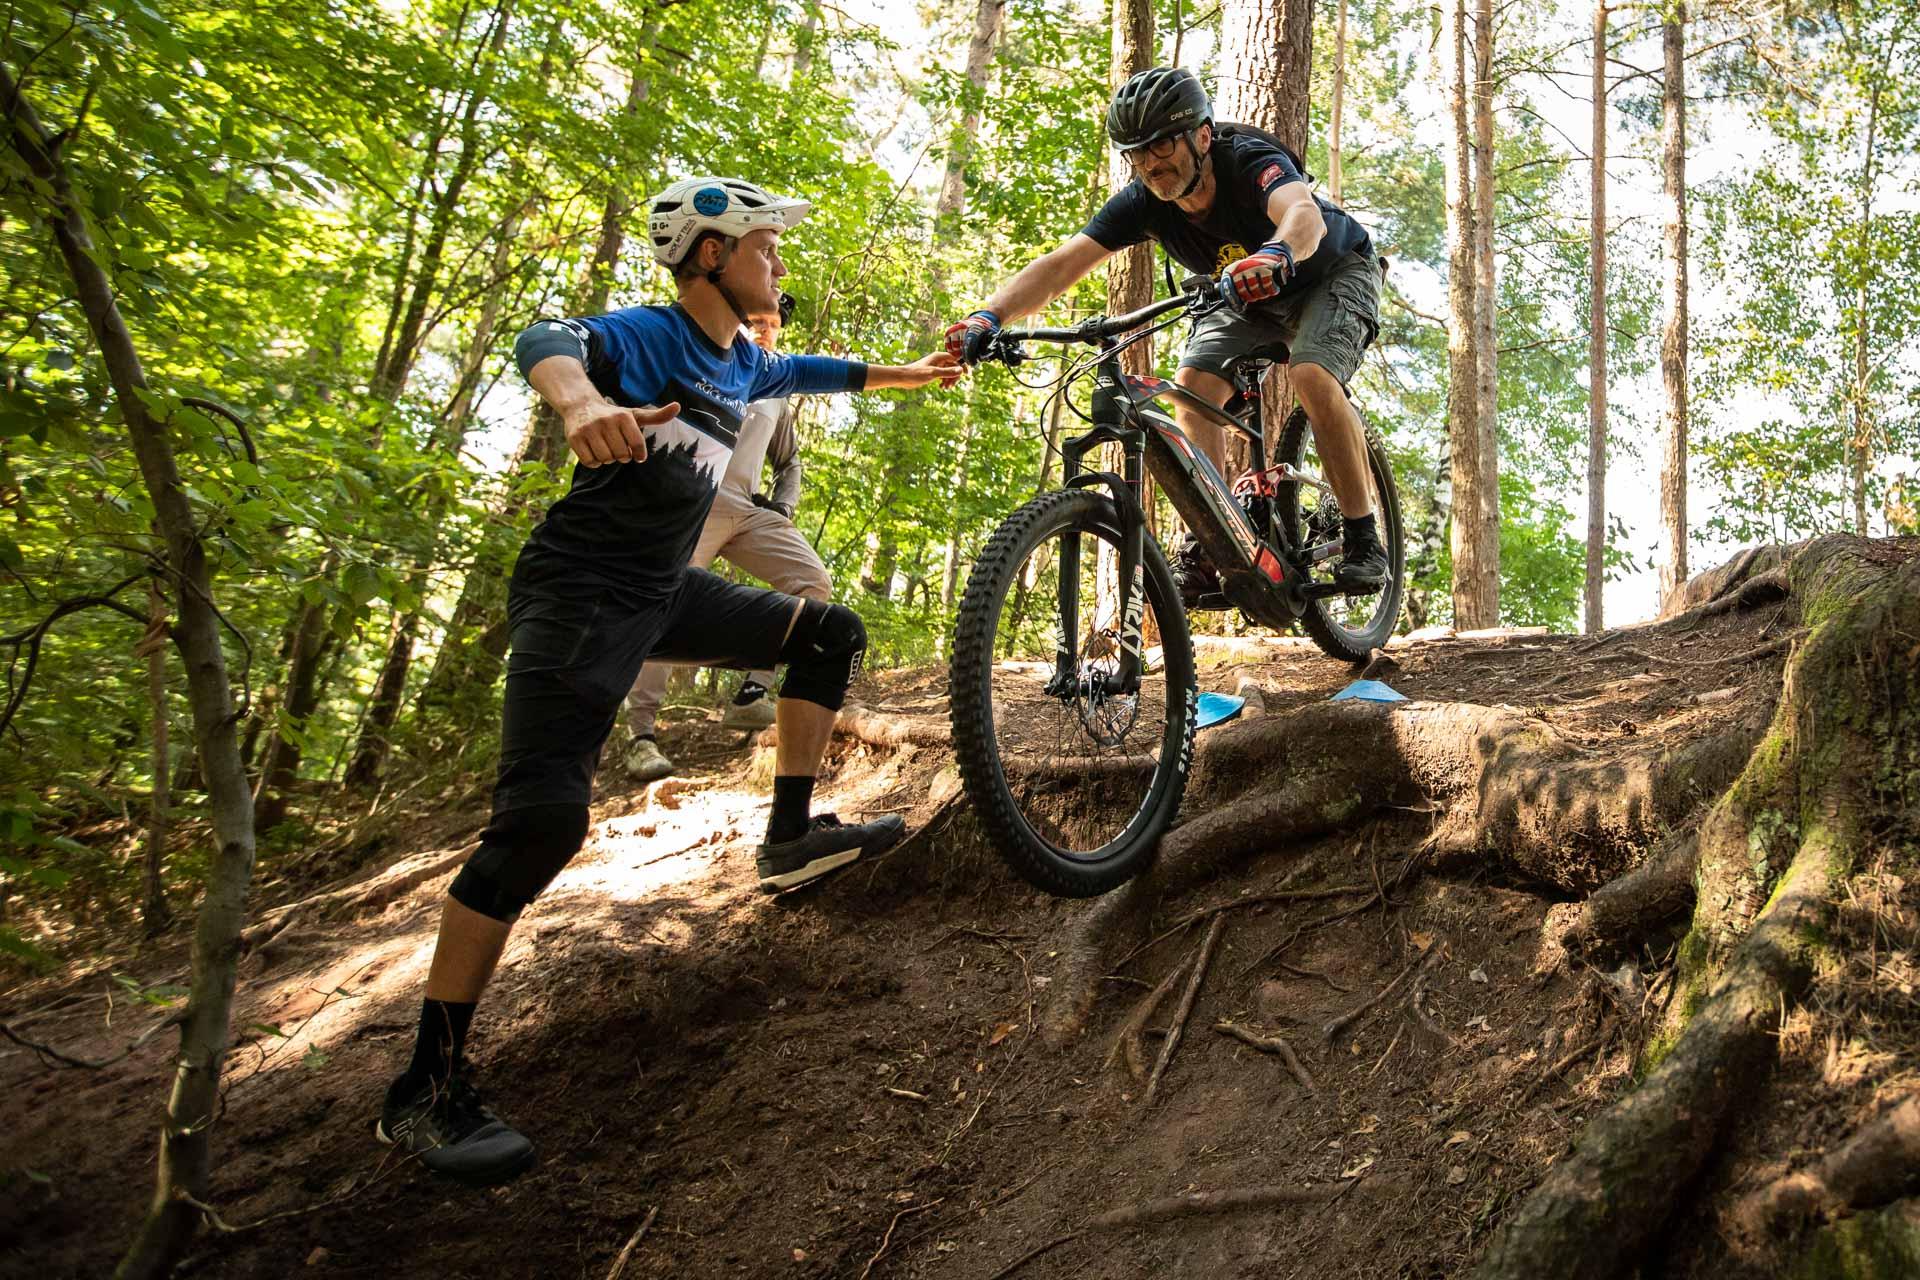 eMTB eBike Fortgeschritten Fahrtechnik Kurs in Siegen - Rock my Trail Bikeschule323